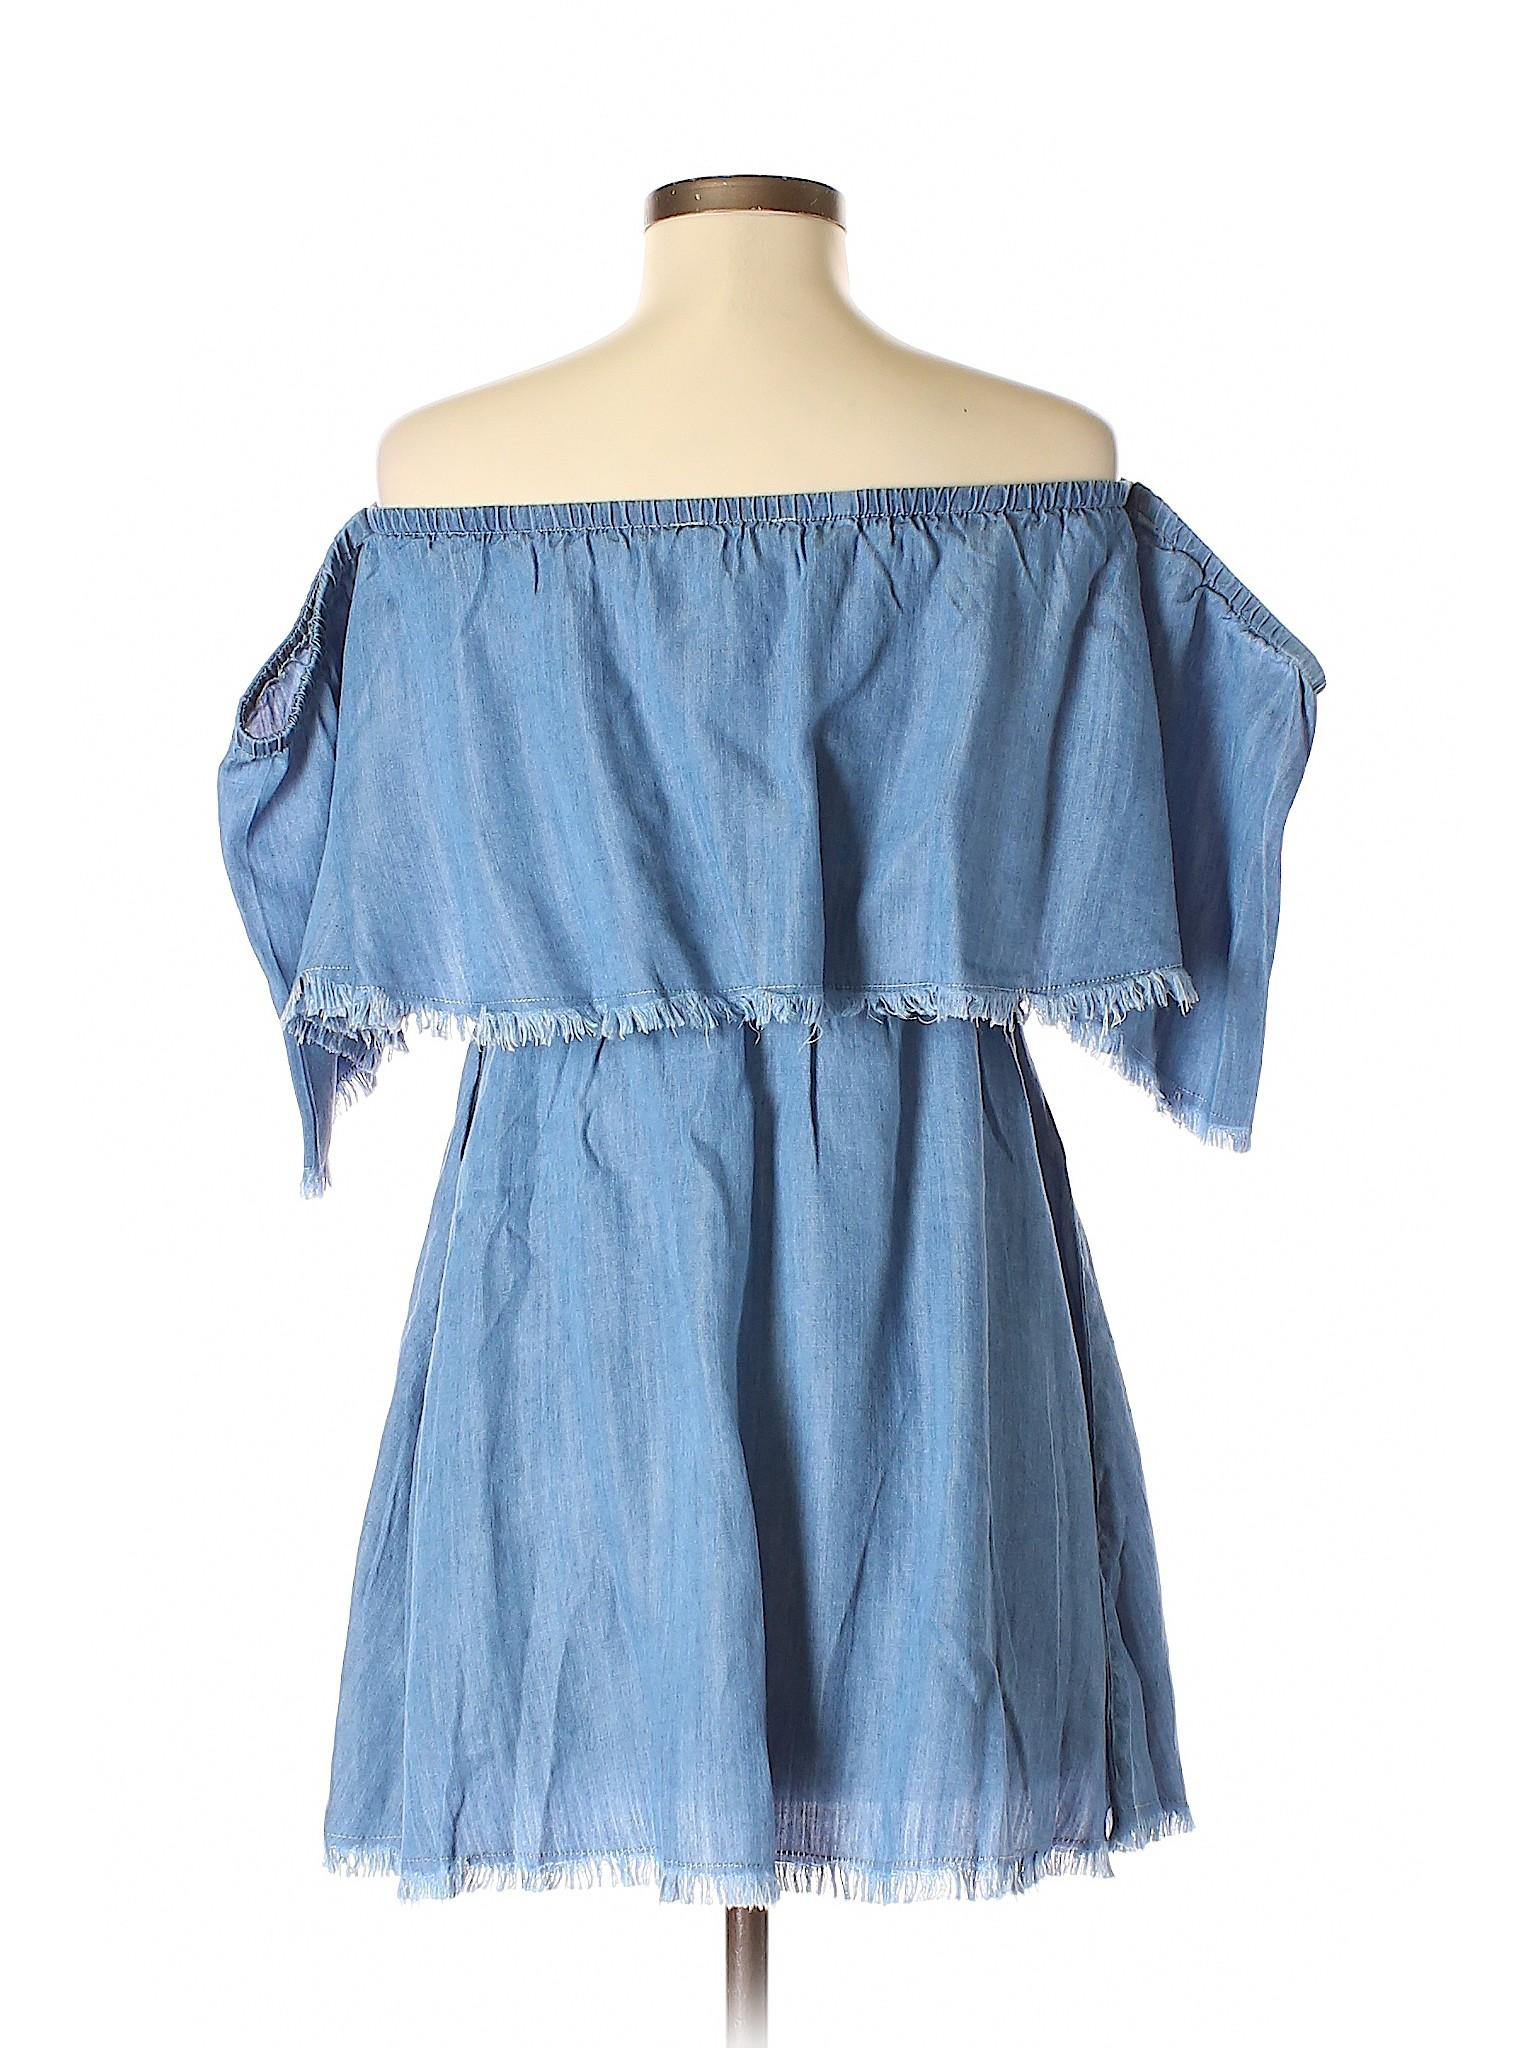 Boutique winter Boutique Elan Elan Casual Dress winter Dress Casual 7qvdr7wz